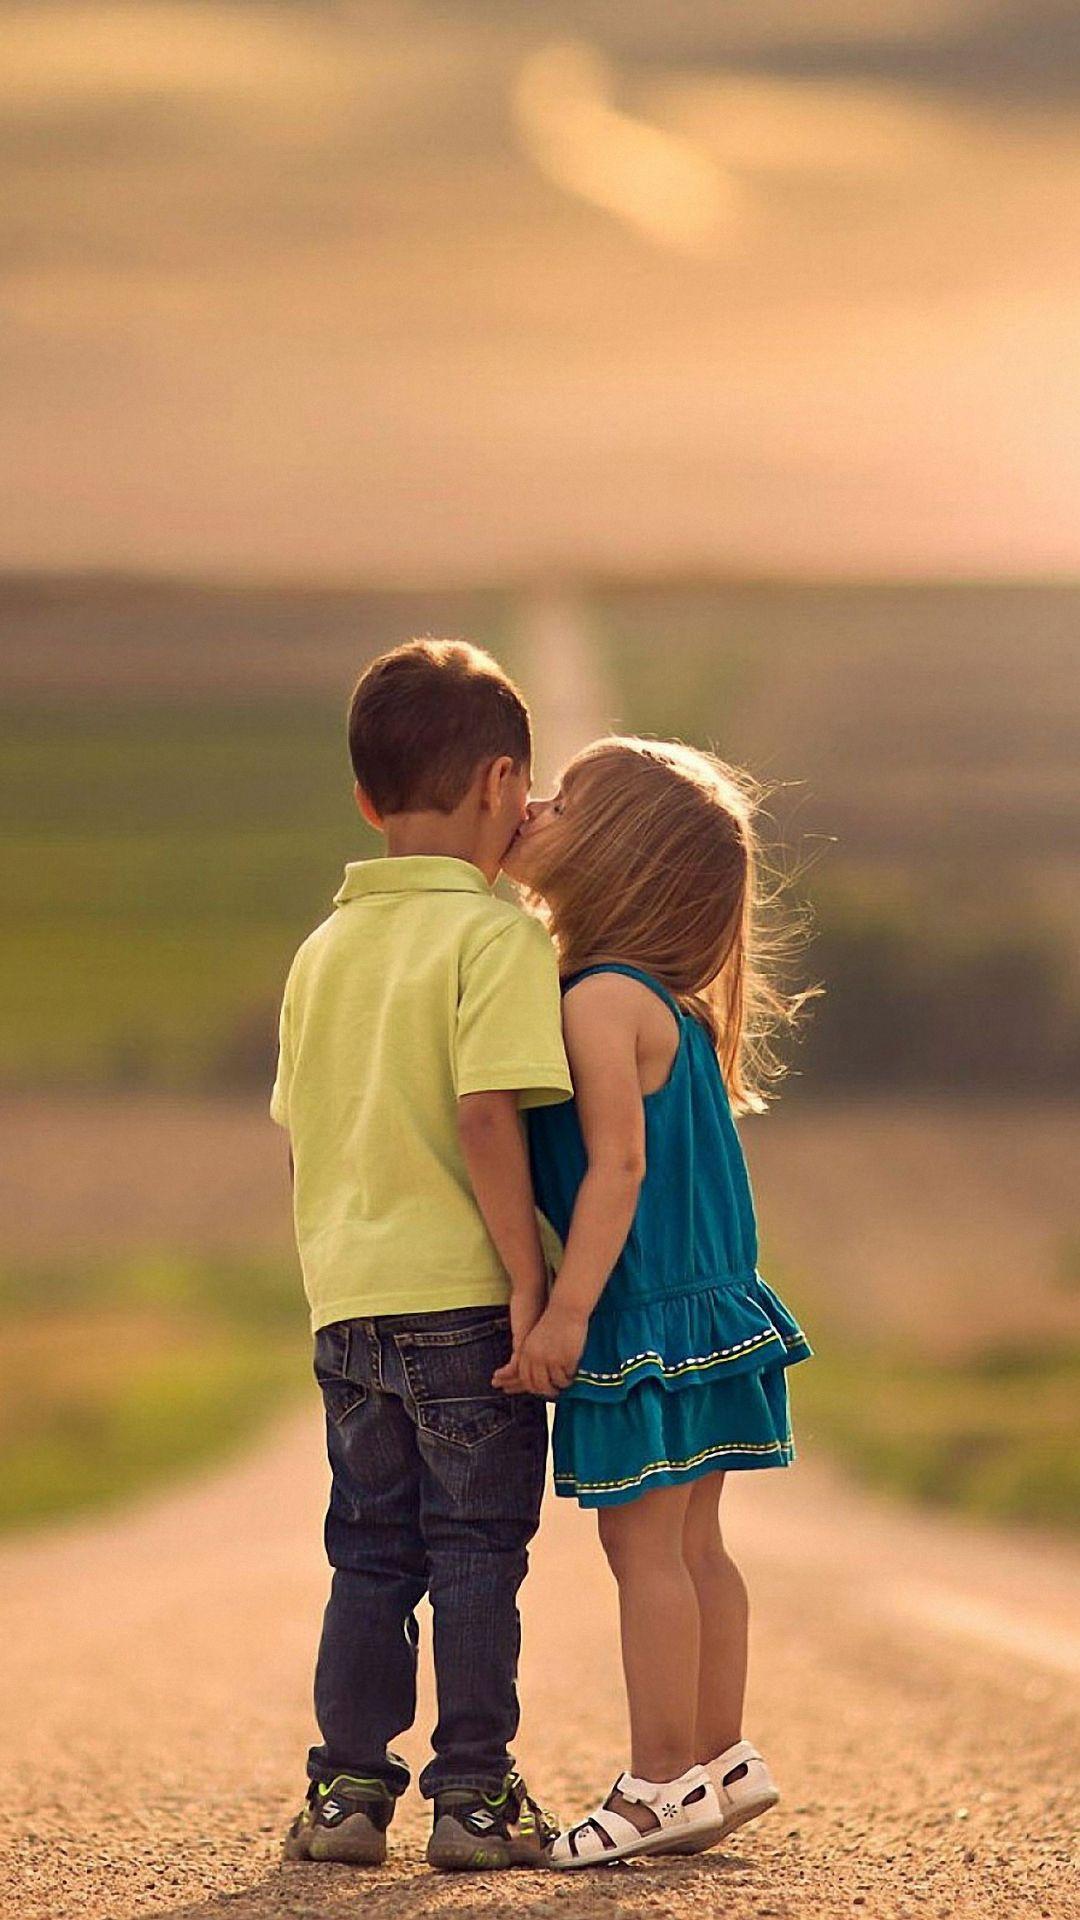 Kissing Hd Wallpapers Download Cute Love Wallpapers Love Wallpaper For Mobile Cute Couples Kissing